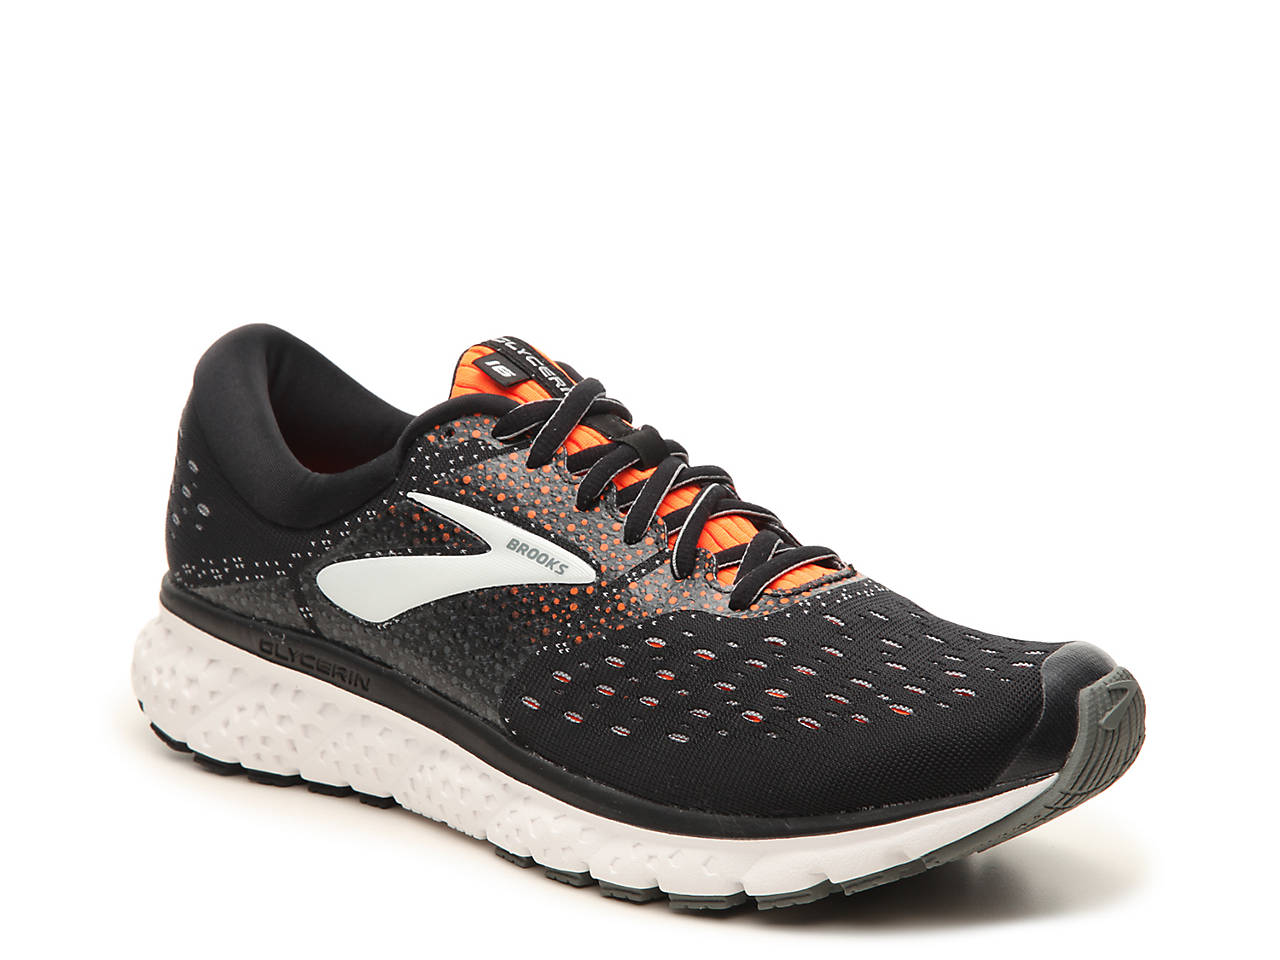 low priced 4430b f7389 Glycerin 16 Running Shoe - Men's